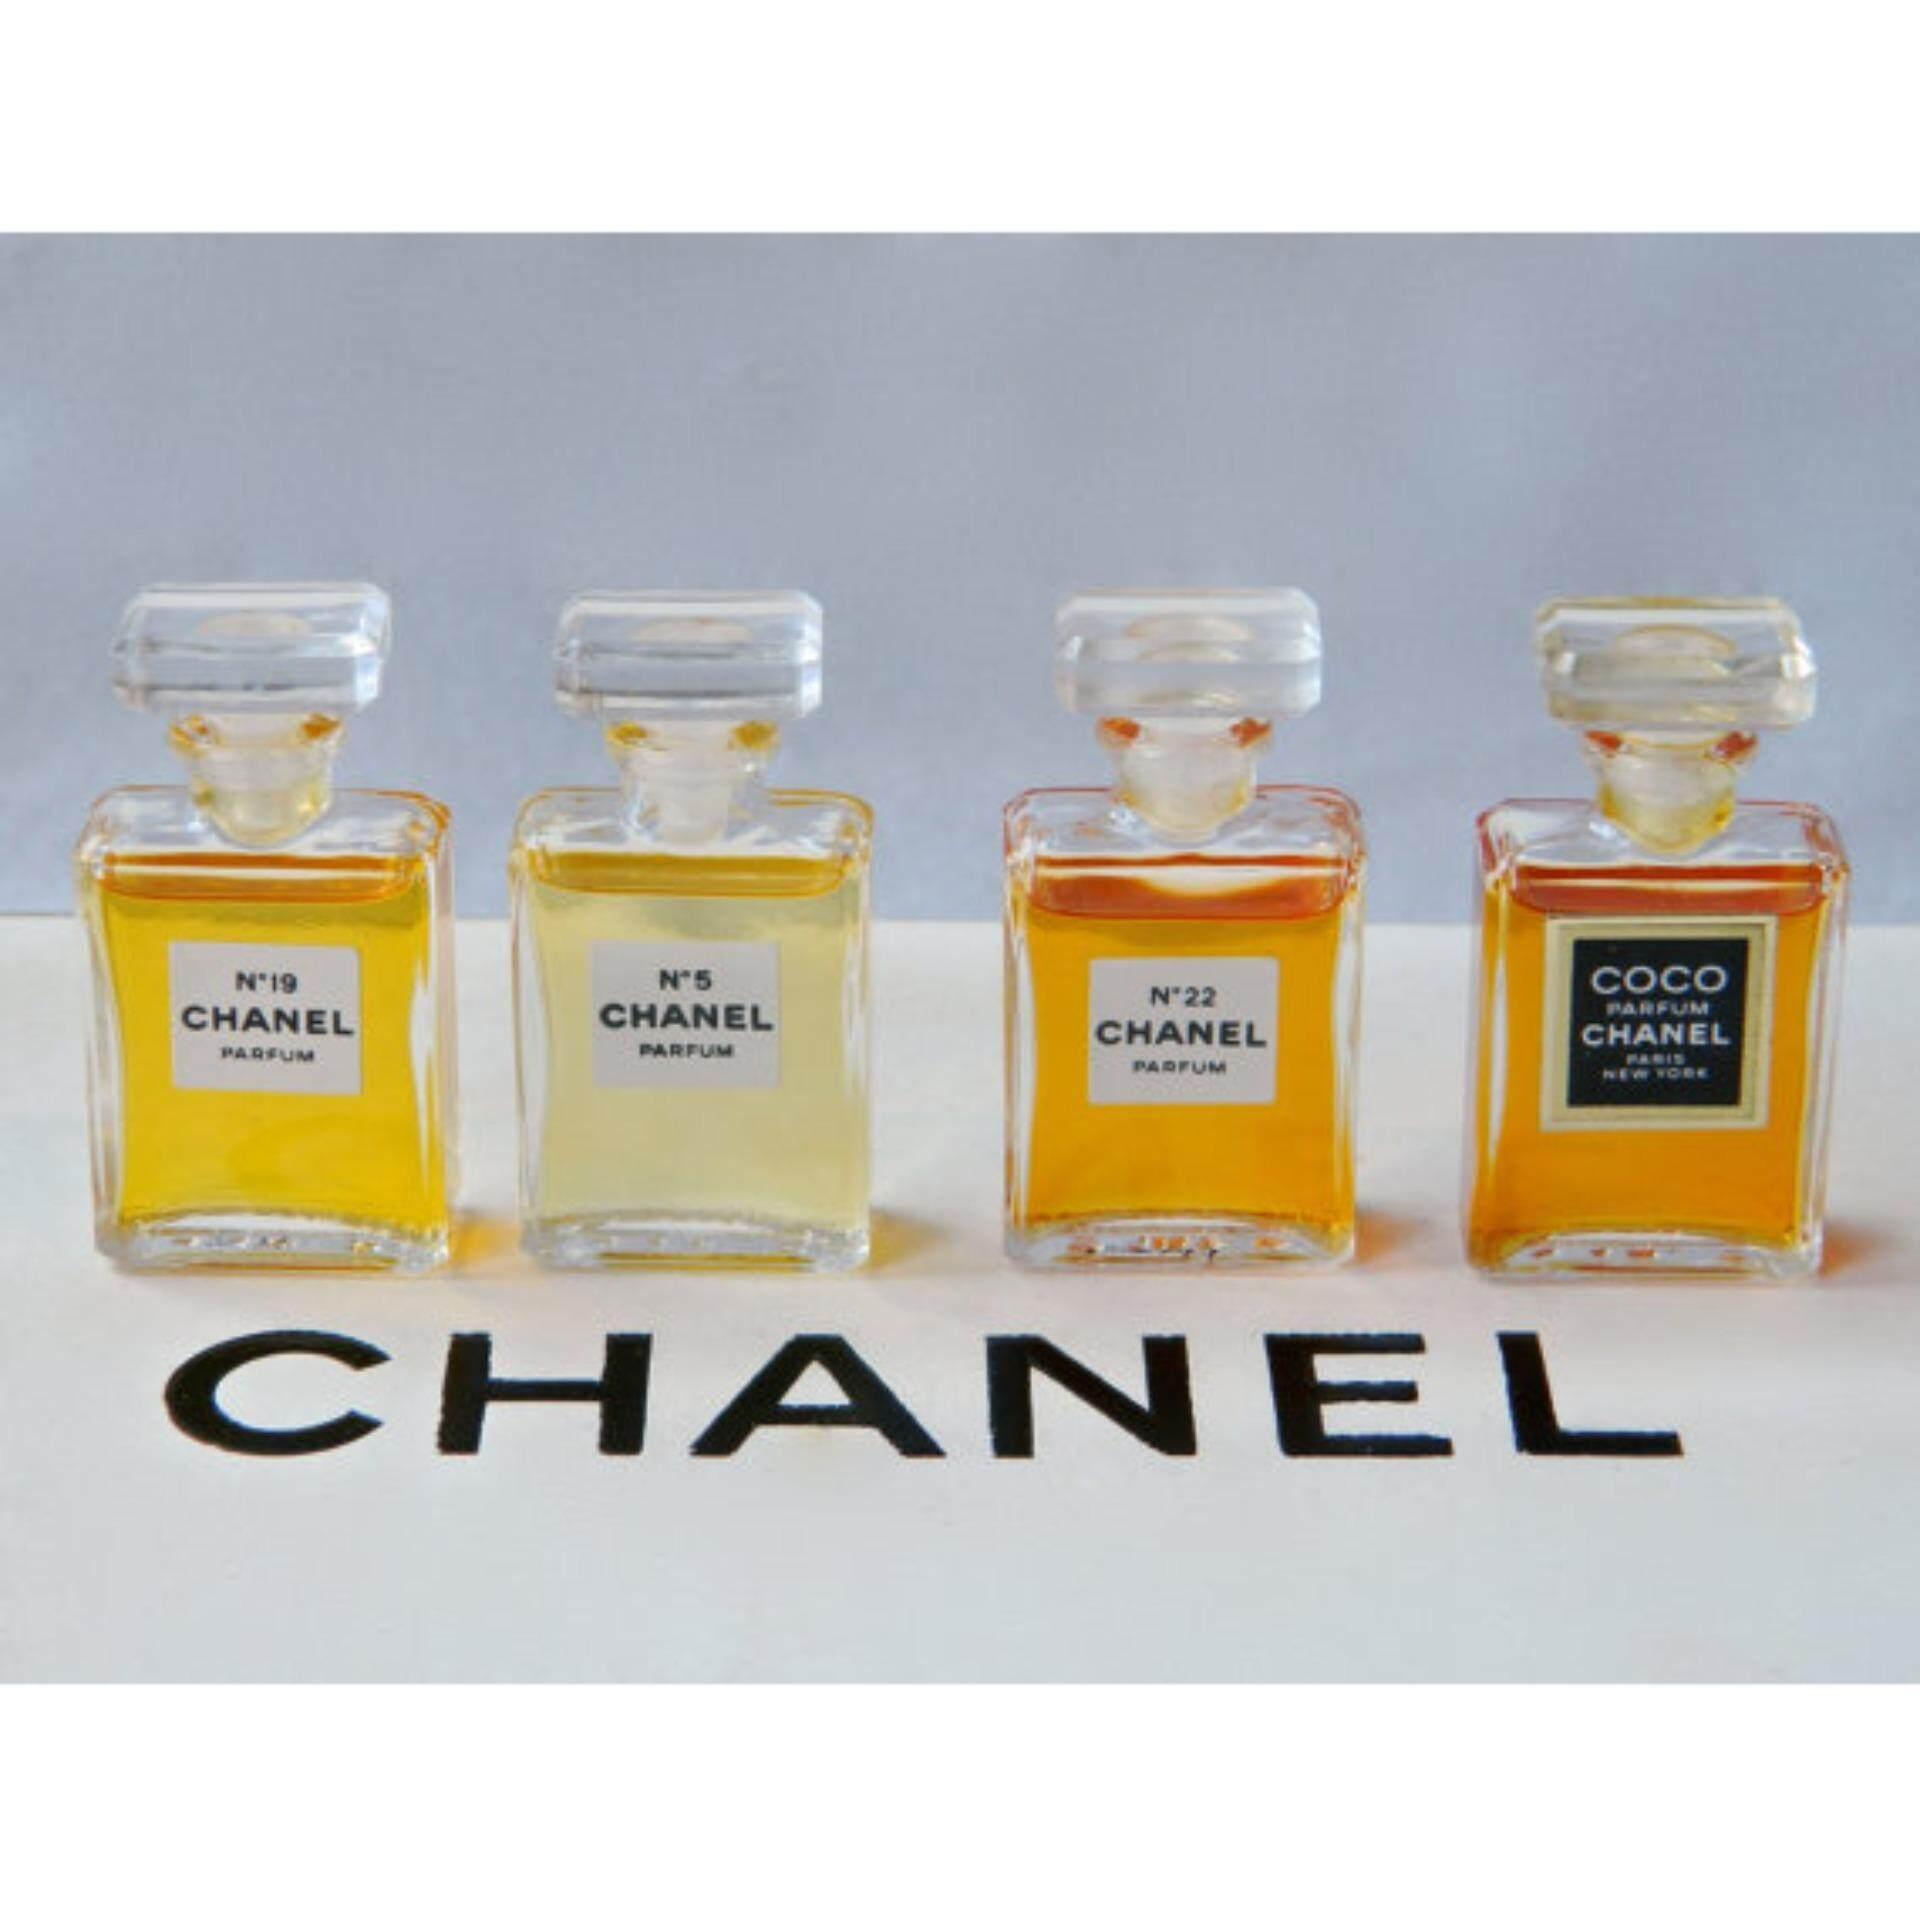 Chanel Perfume 4 In 1 Premium Gift Set Miniature Chanel Perfume